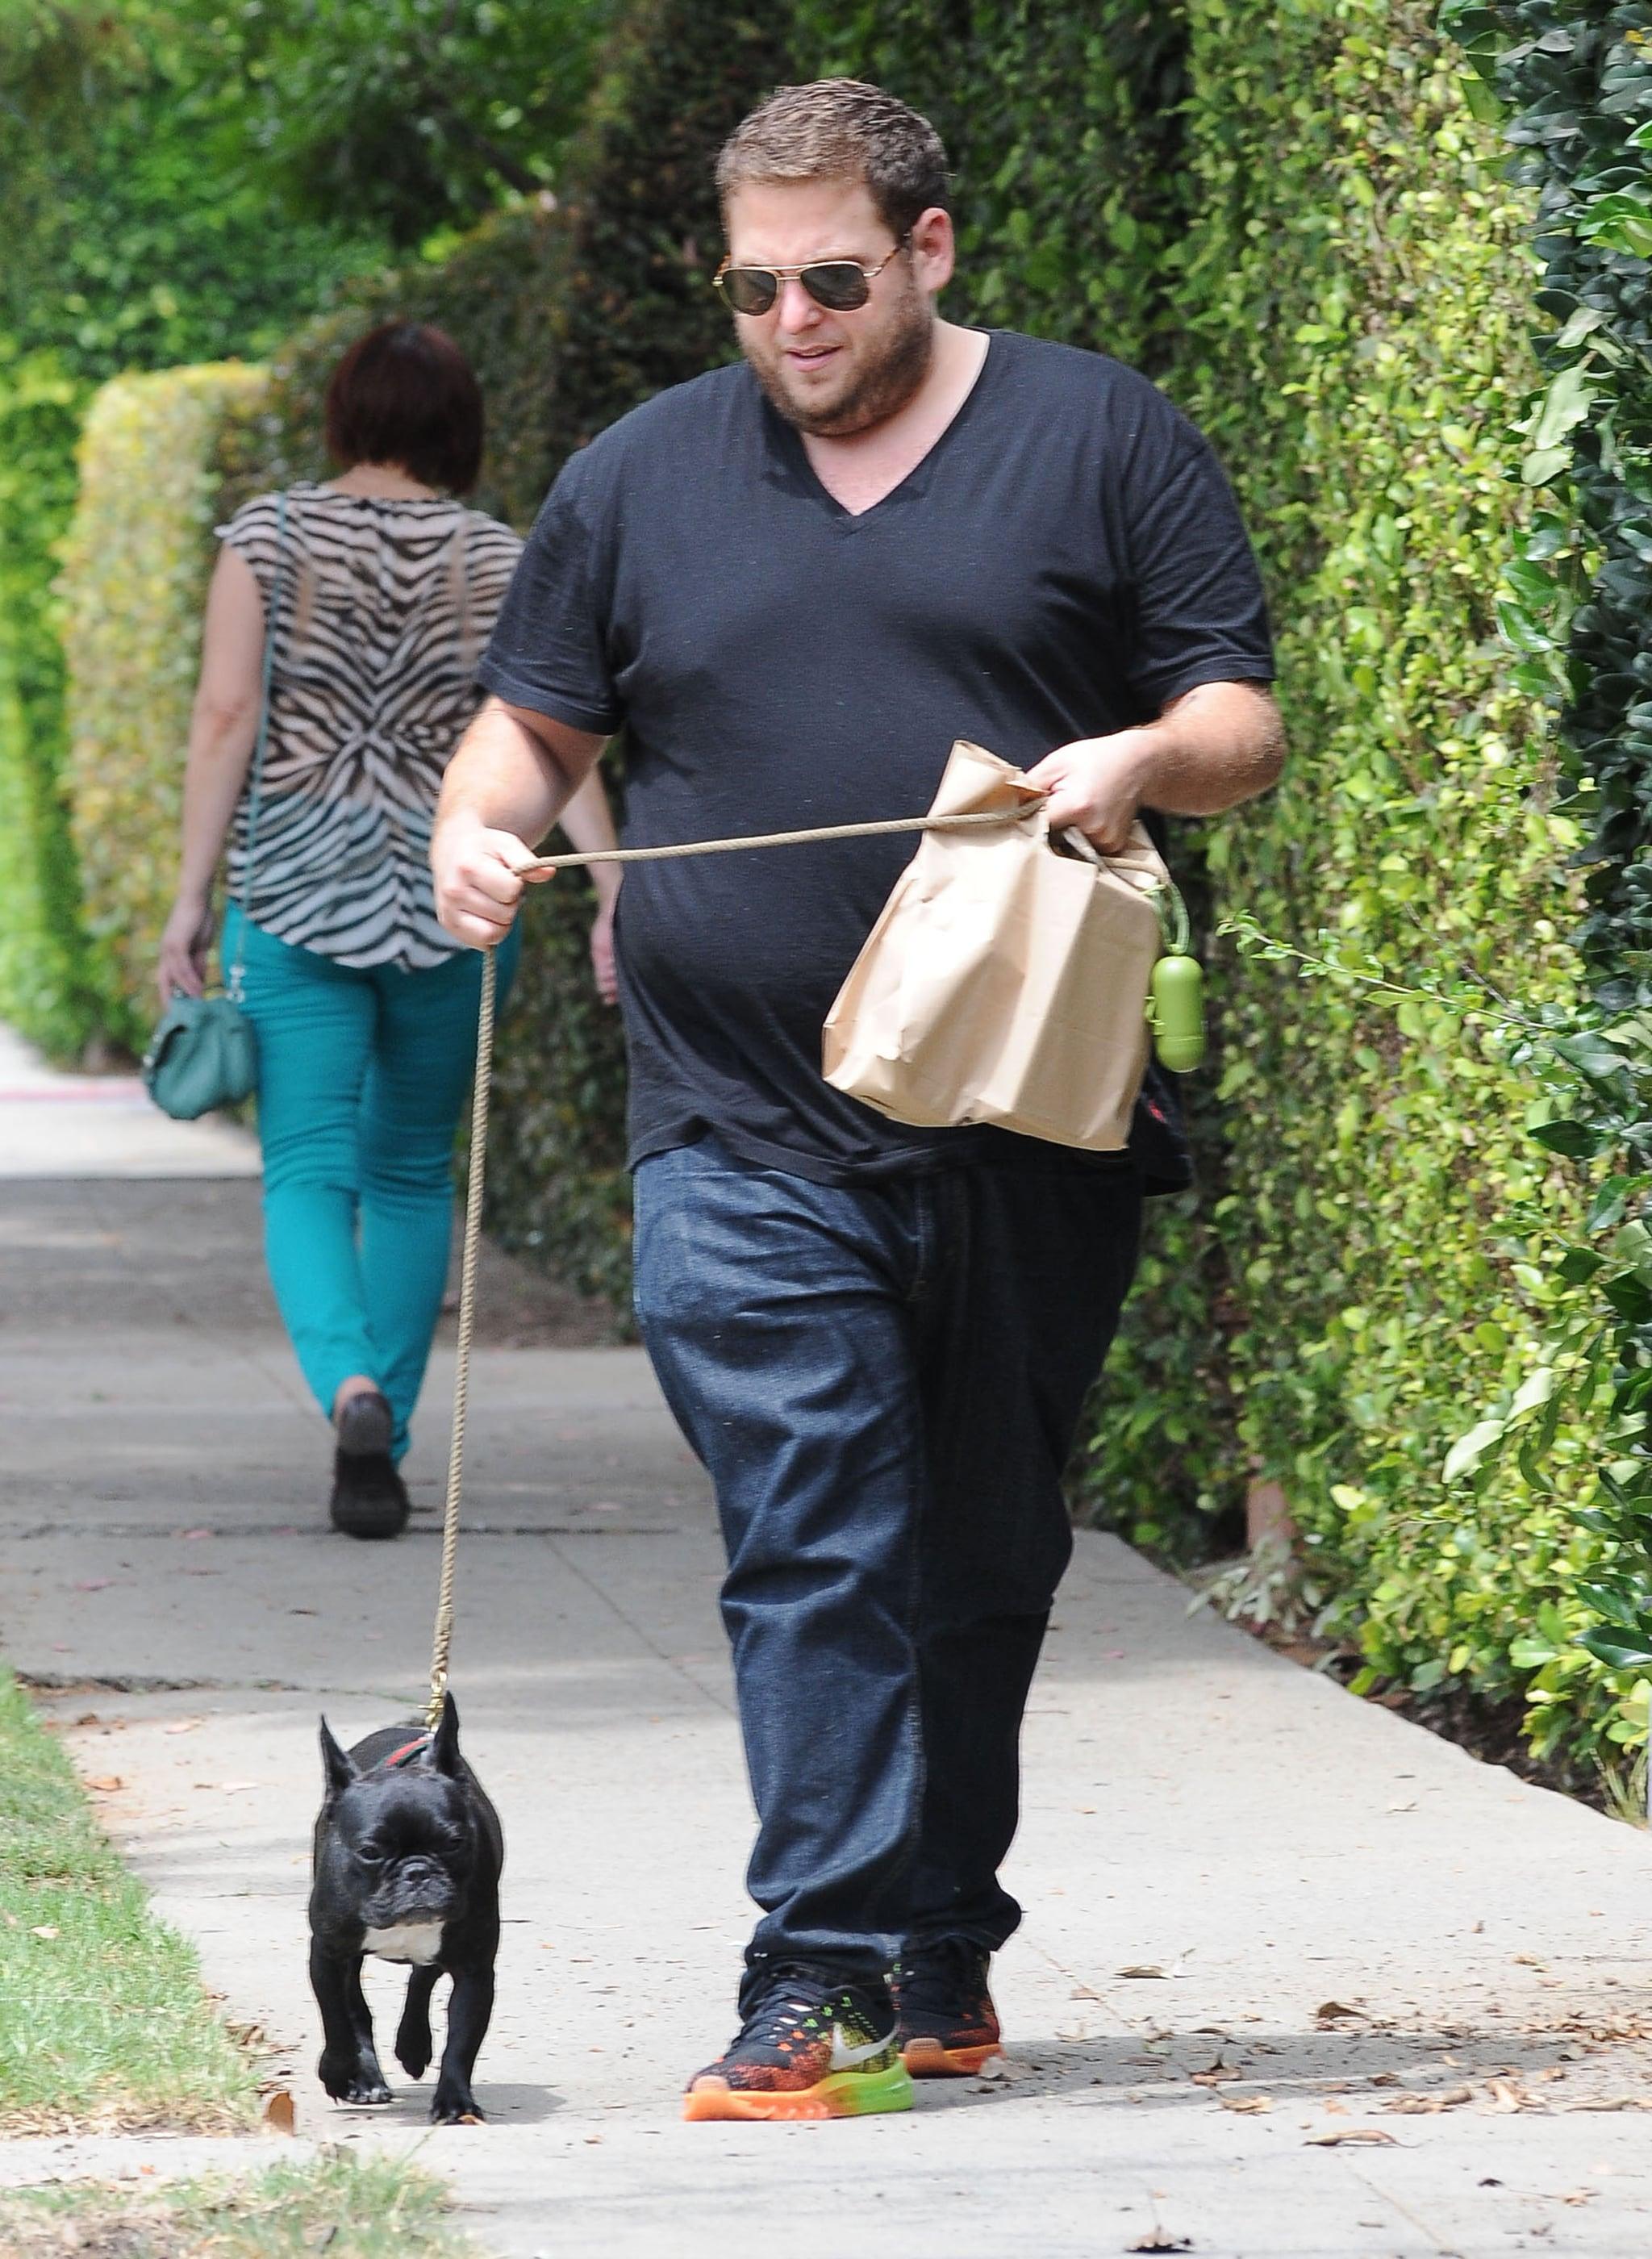 Jonah Hill took his cute dog on a walk in LA on Saturday.